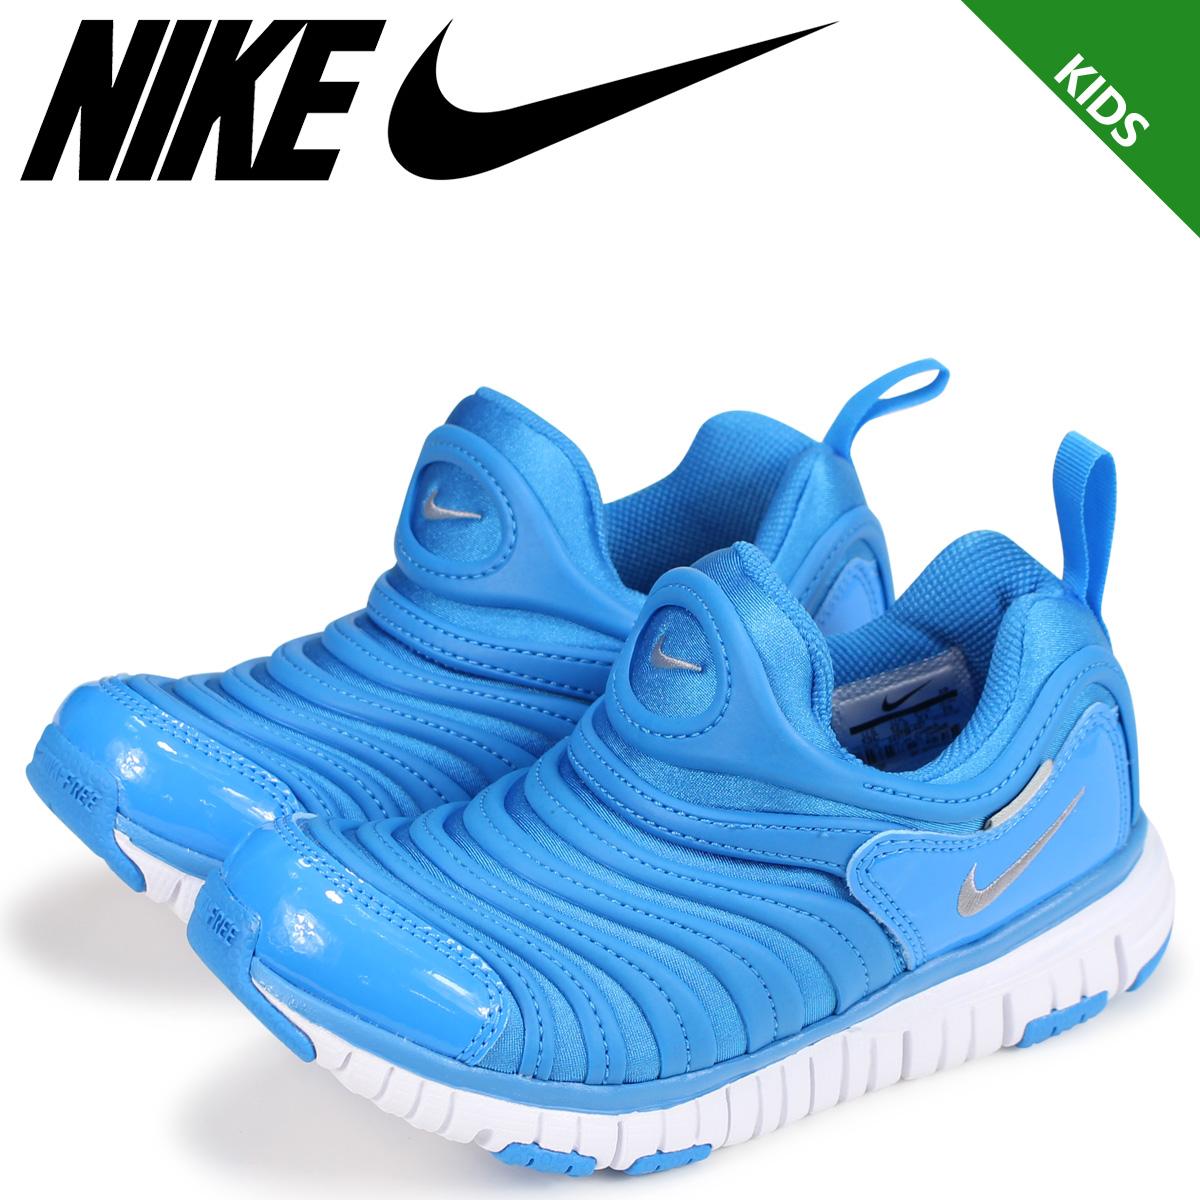 timeless design b20f9 8c91d NIKE Nike dynamo-free kids sneakers DYNAMO FREE PS 343,738-427 blue  9 ...